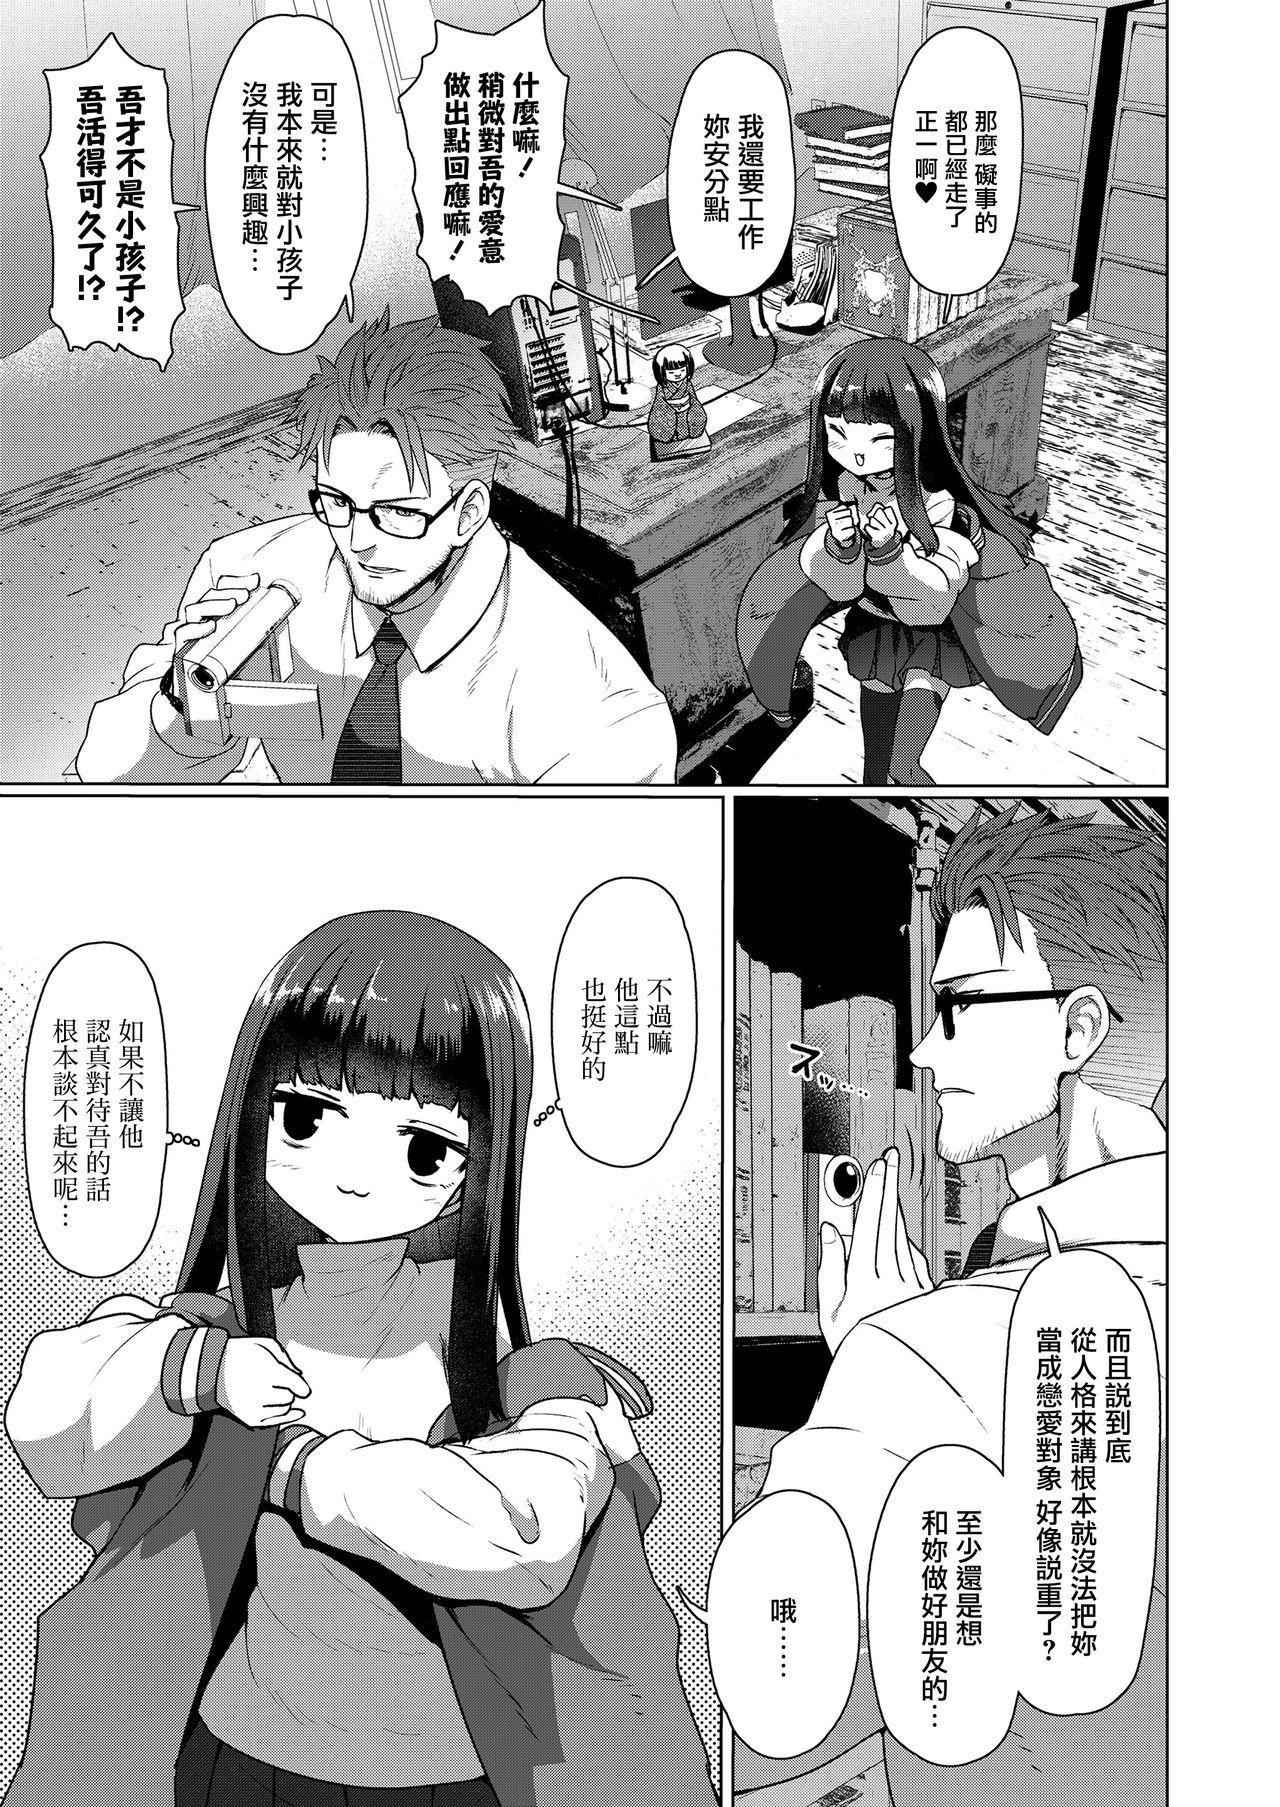 Kyouju to Bakeneko | 教授與貓妖 5